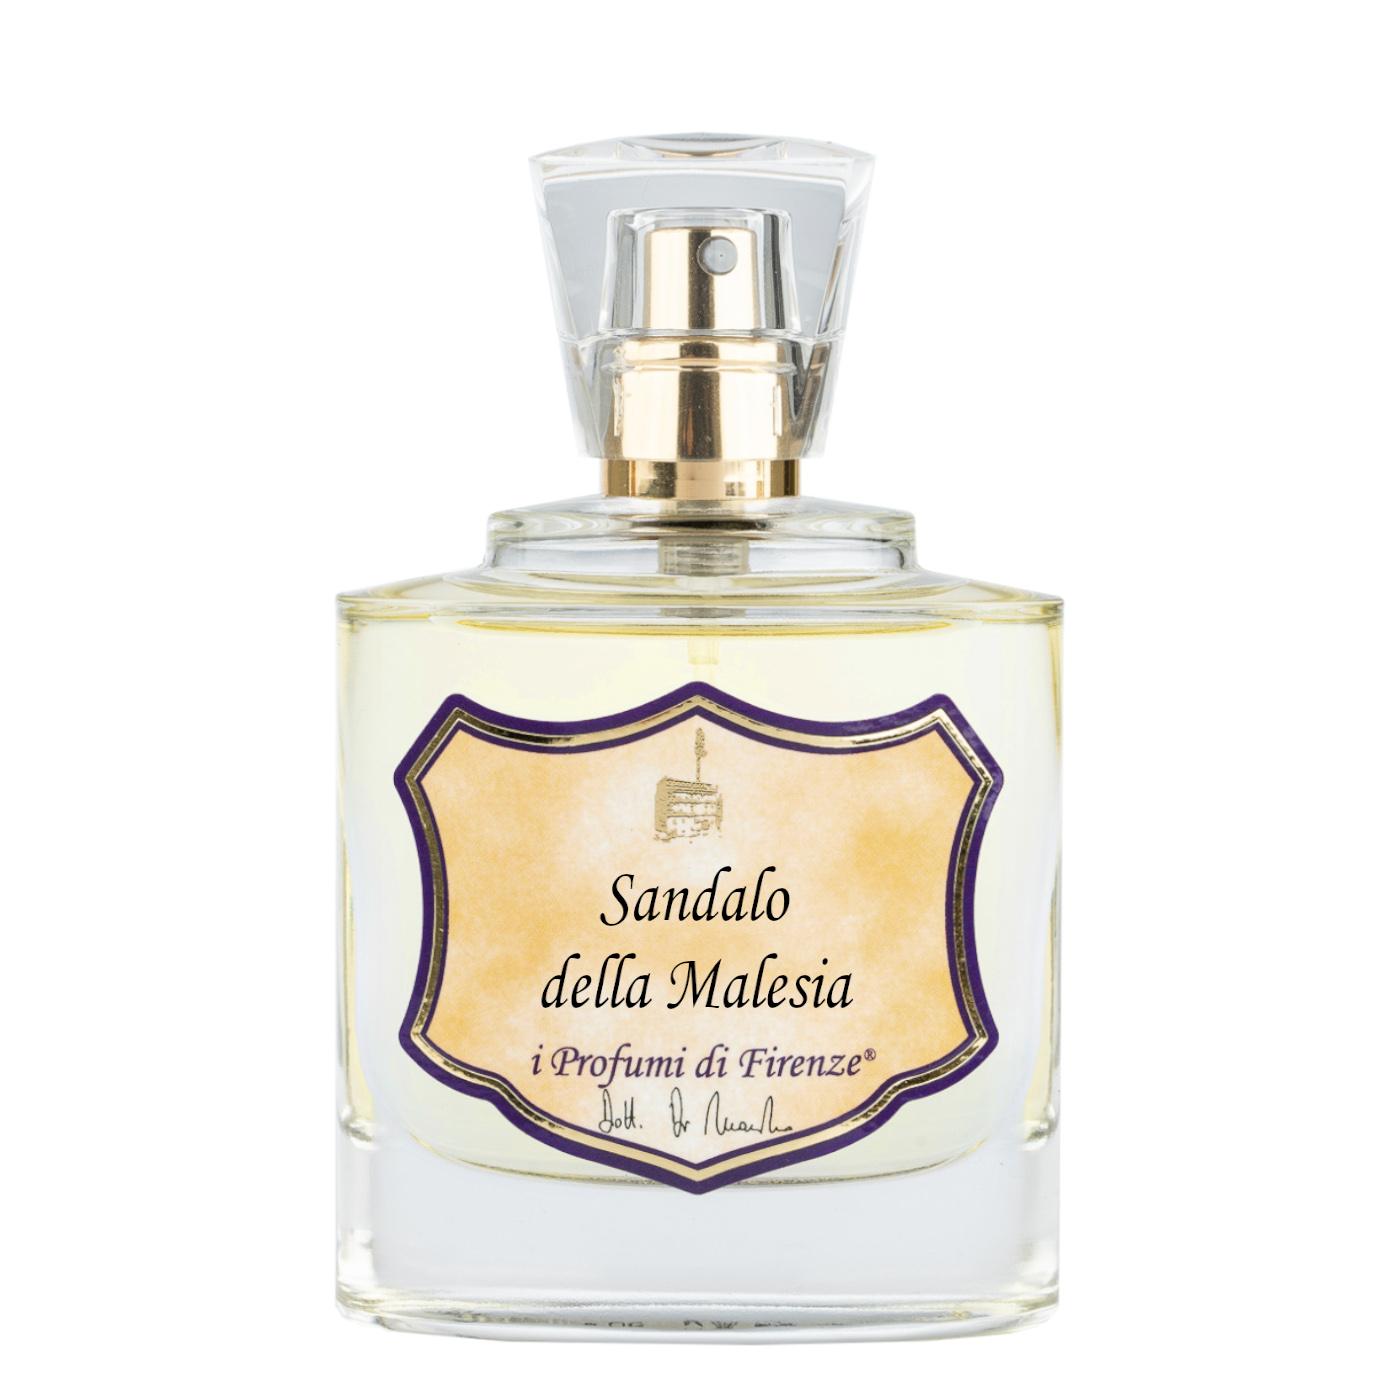 SANDALO DELLA MALESIA - Eau de Parfum-0